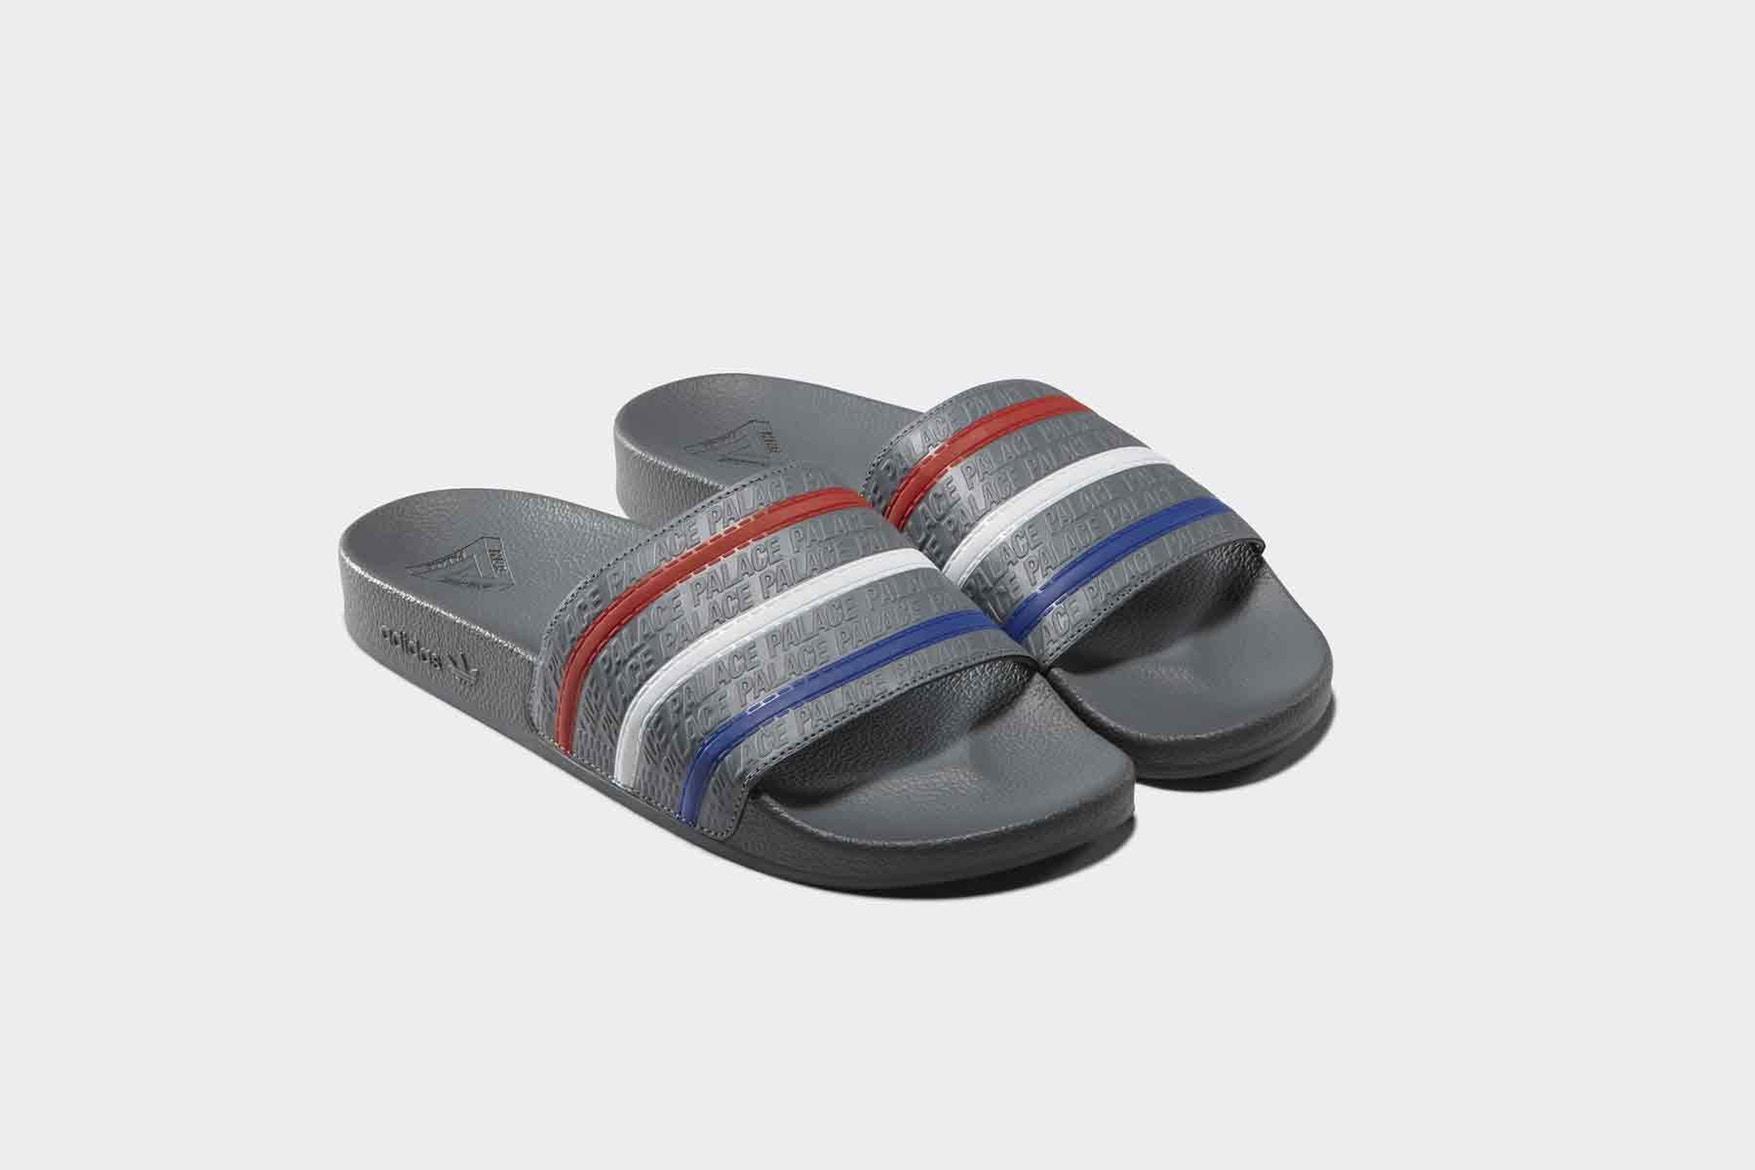 palace-adidas-originals-summer-2018-collection-10.jpg